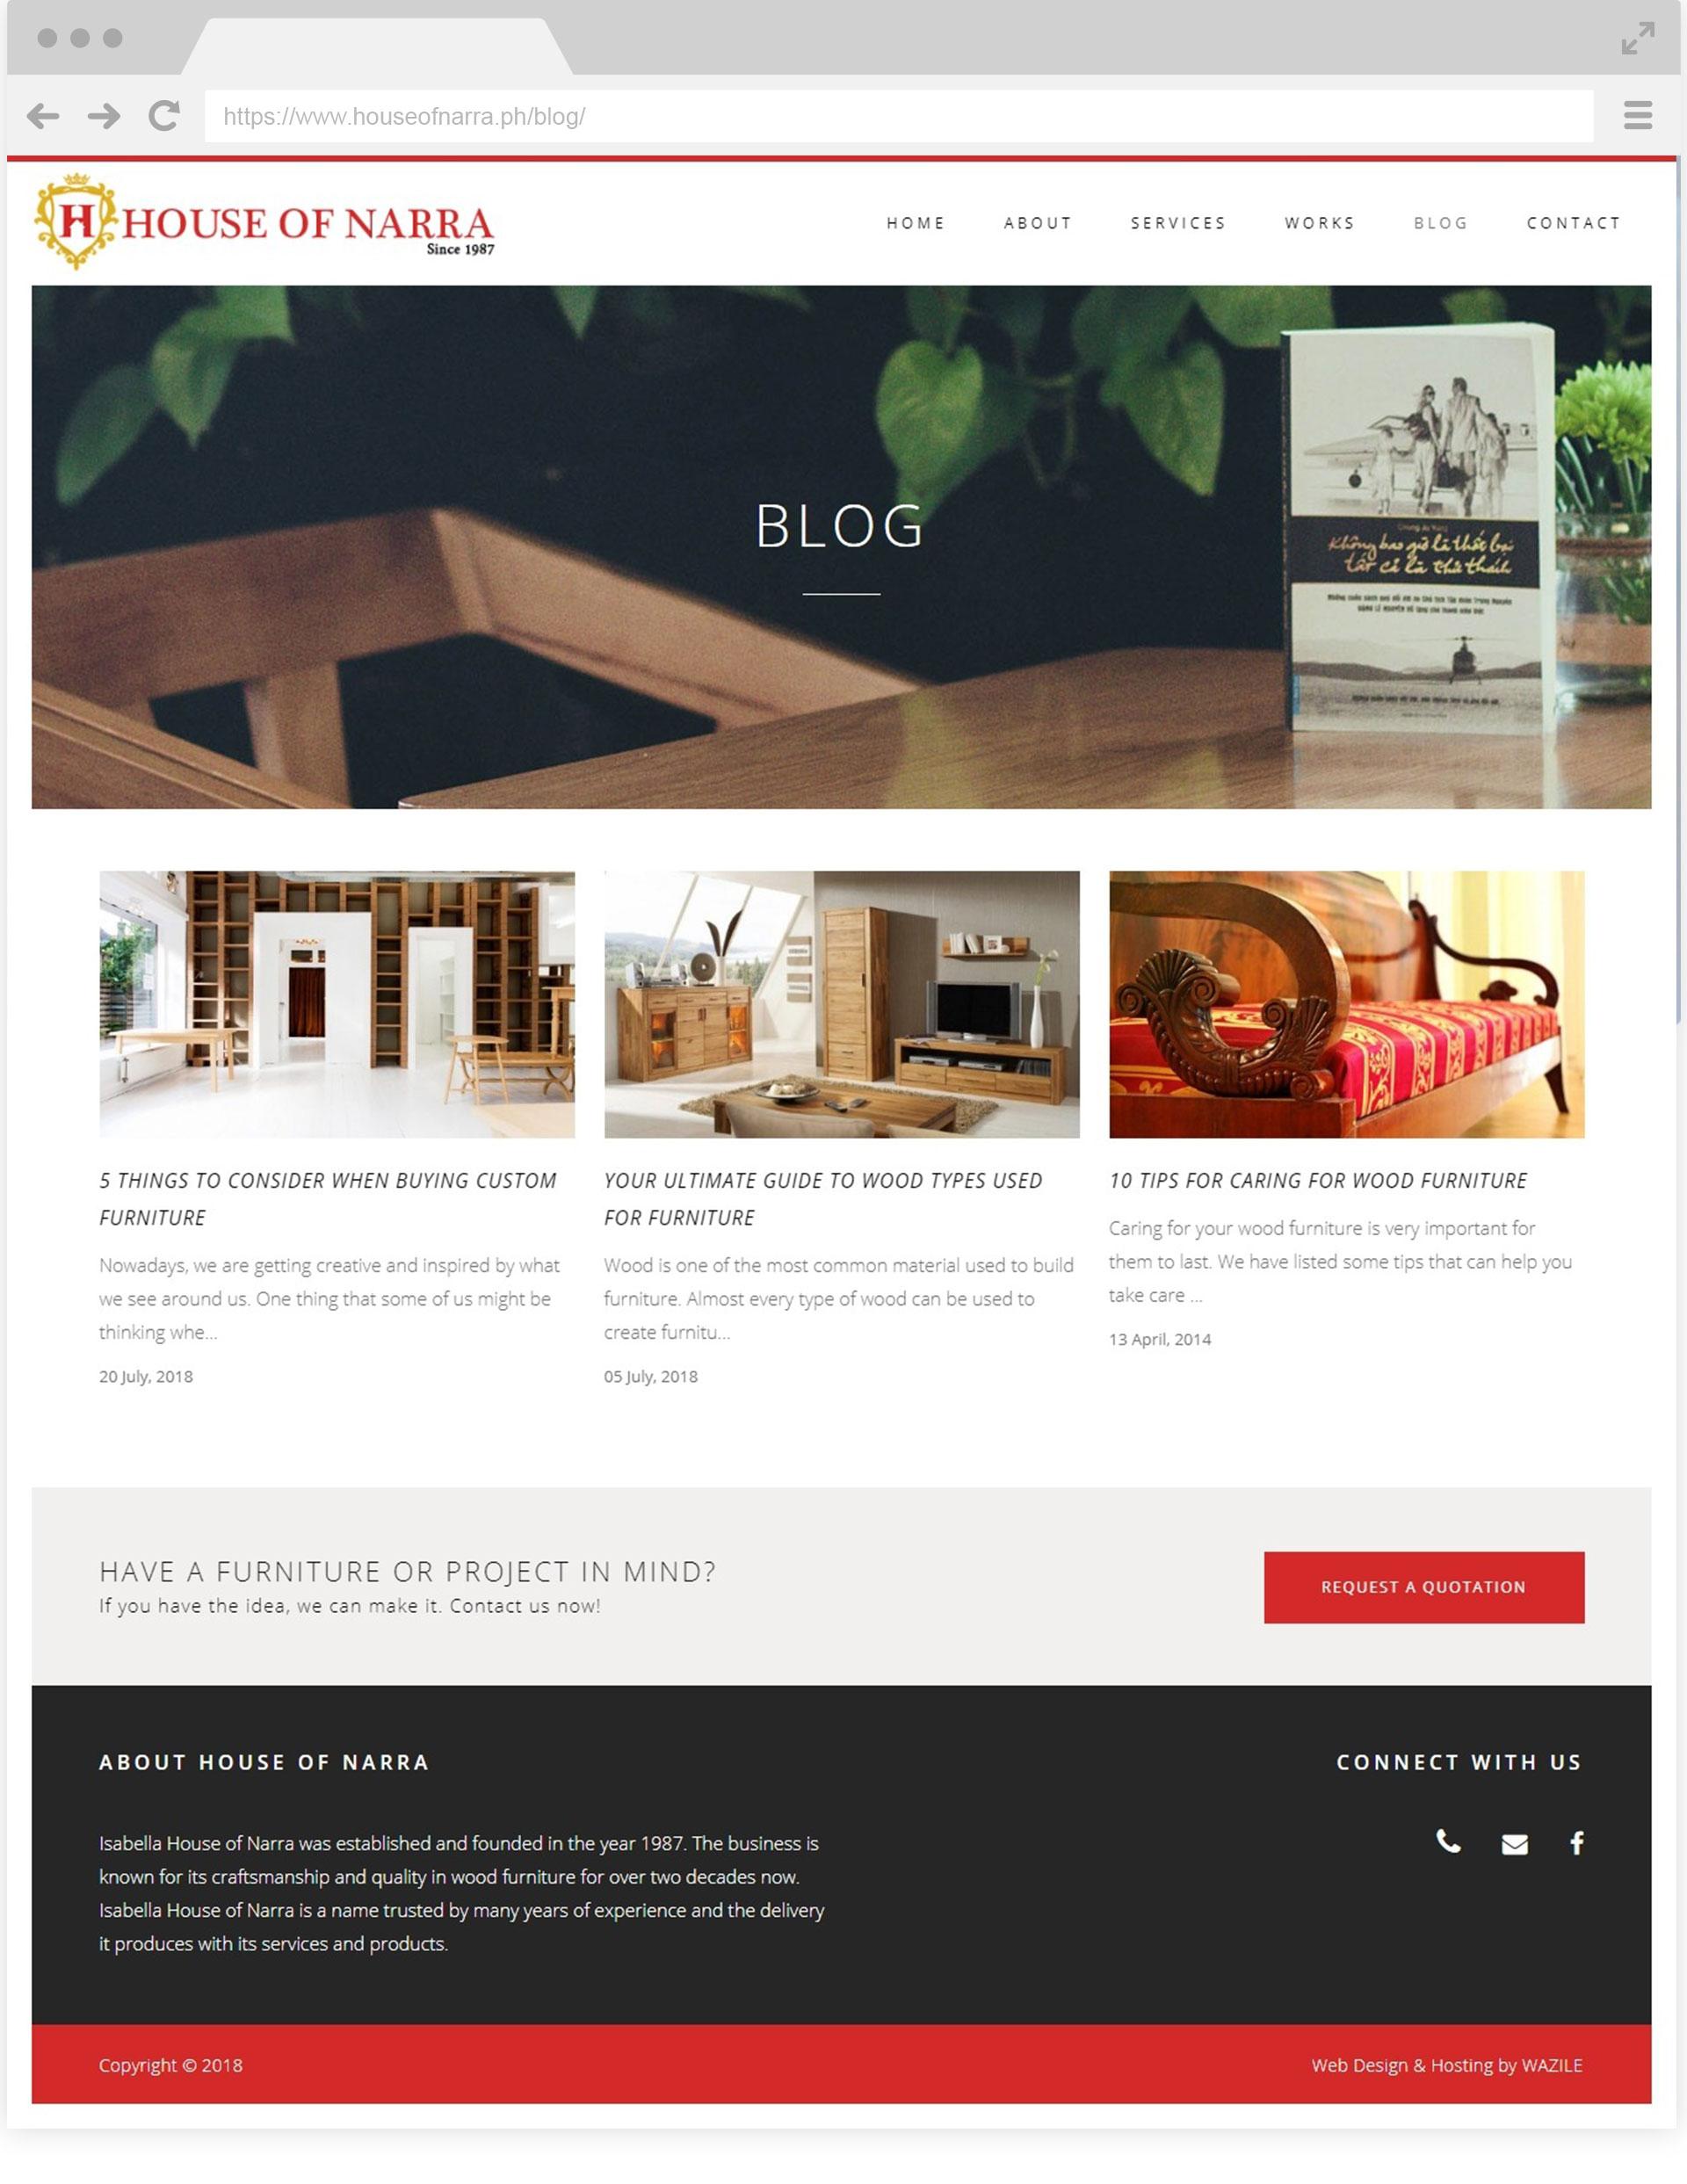 House of Narra Blog